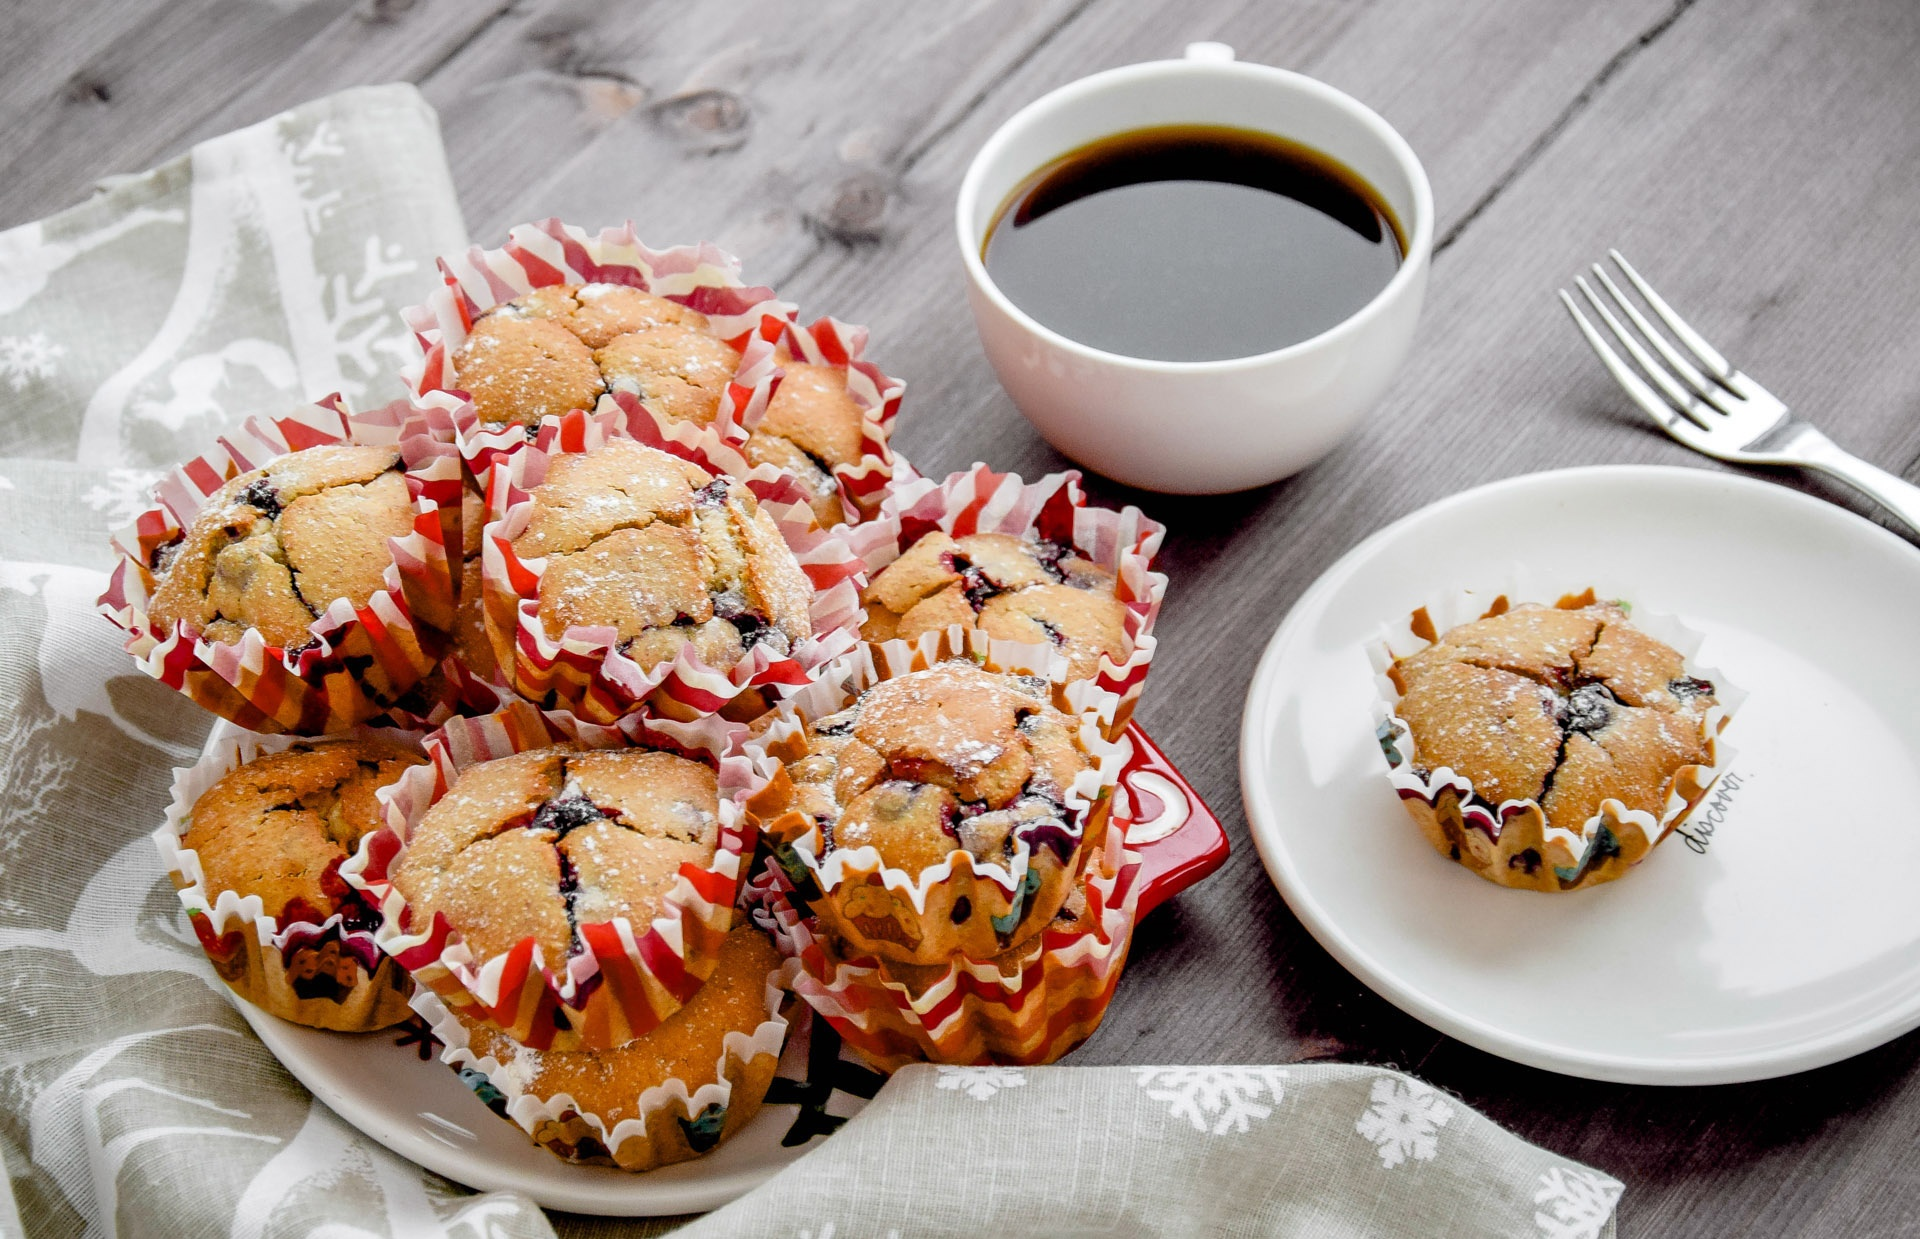 картинки кофе с пирогом